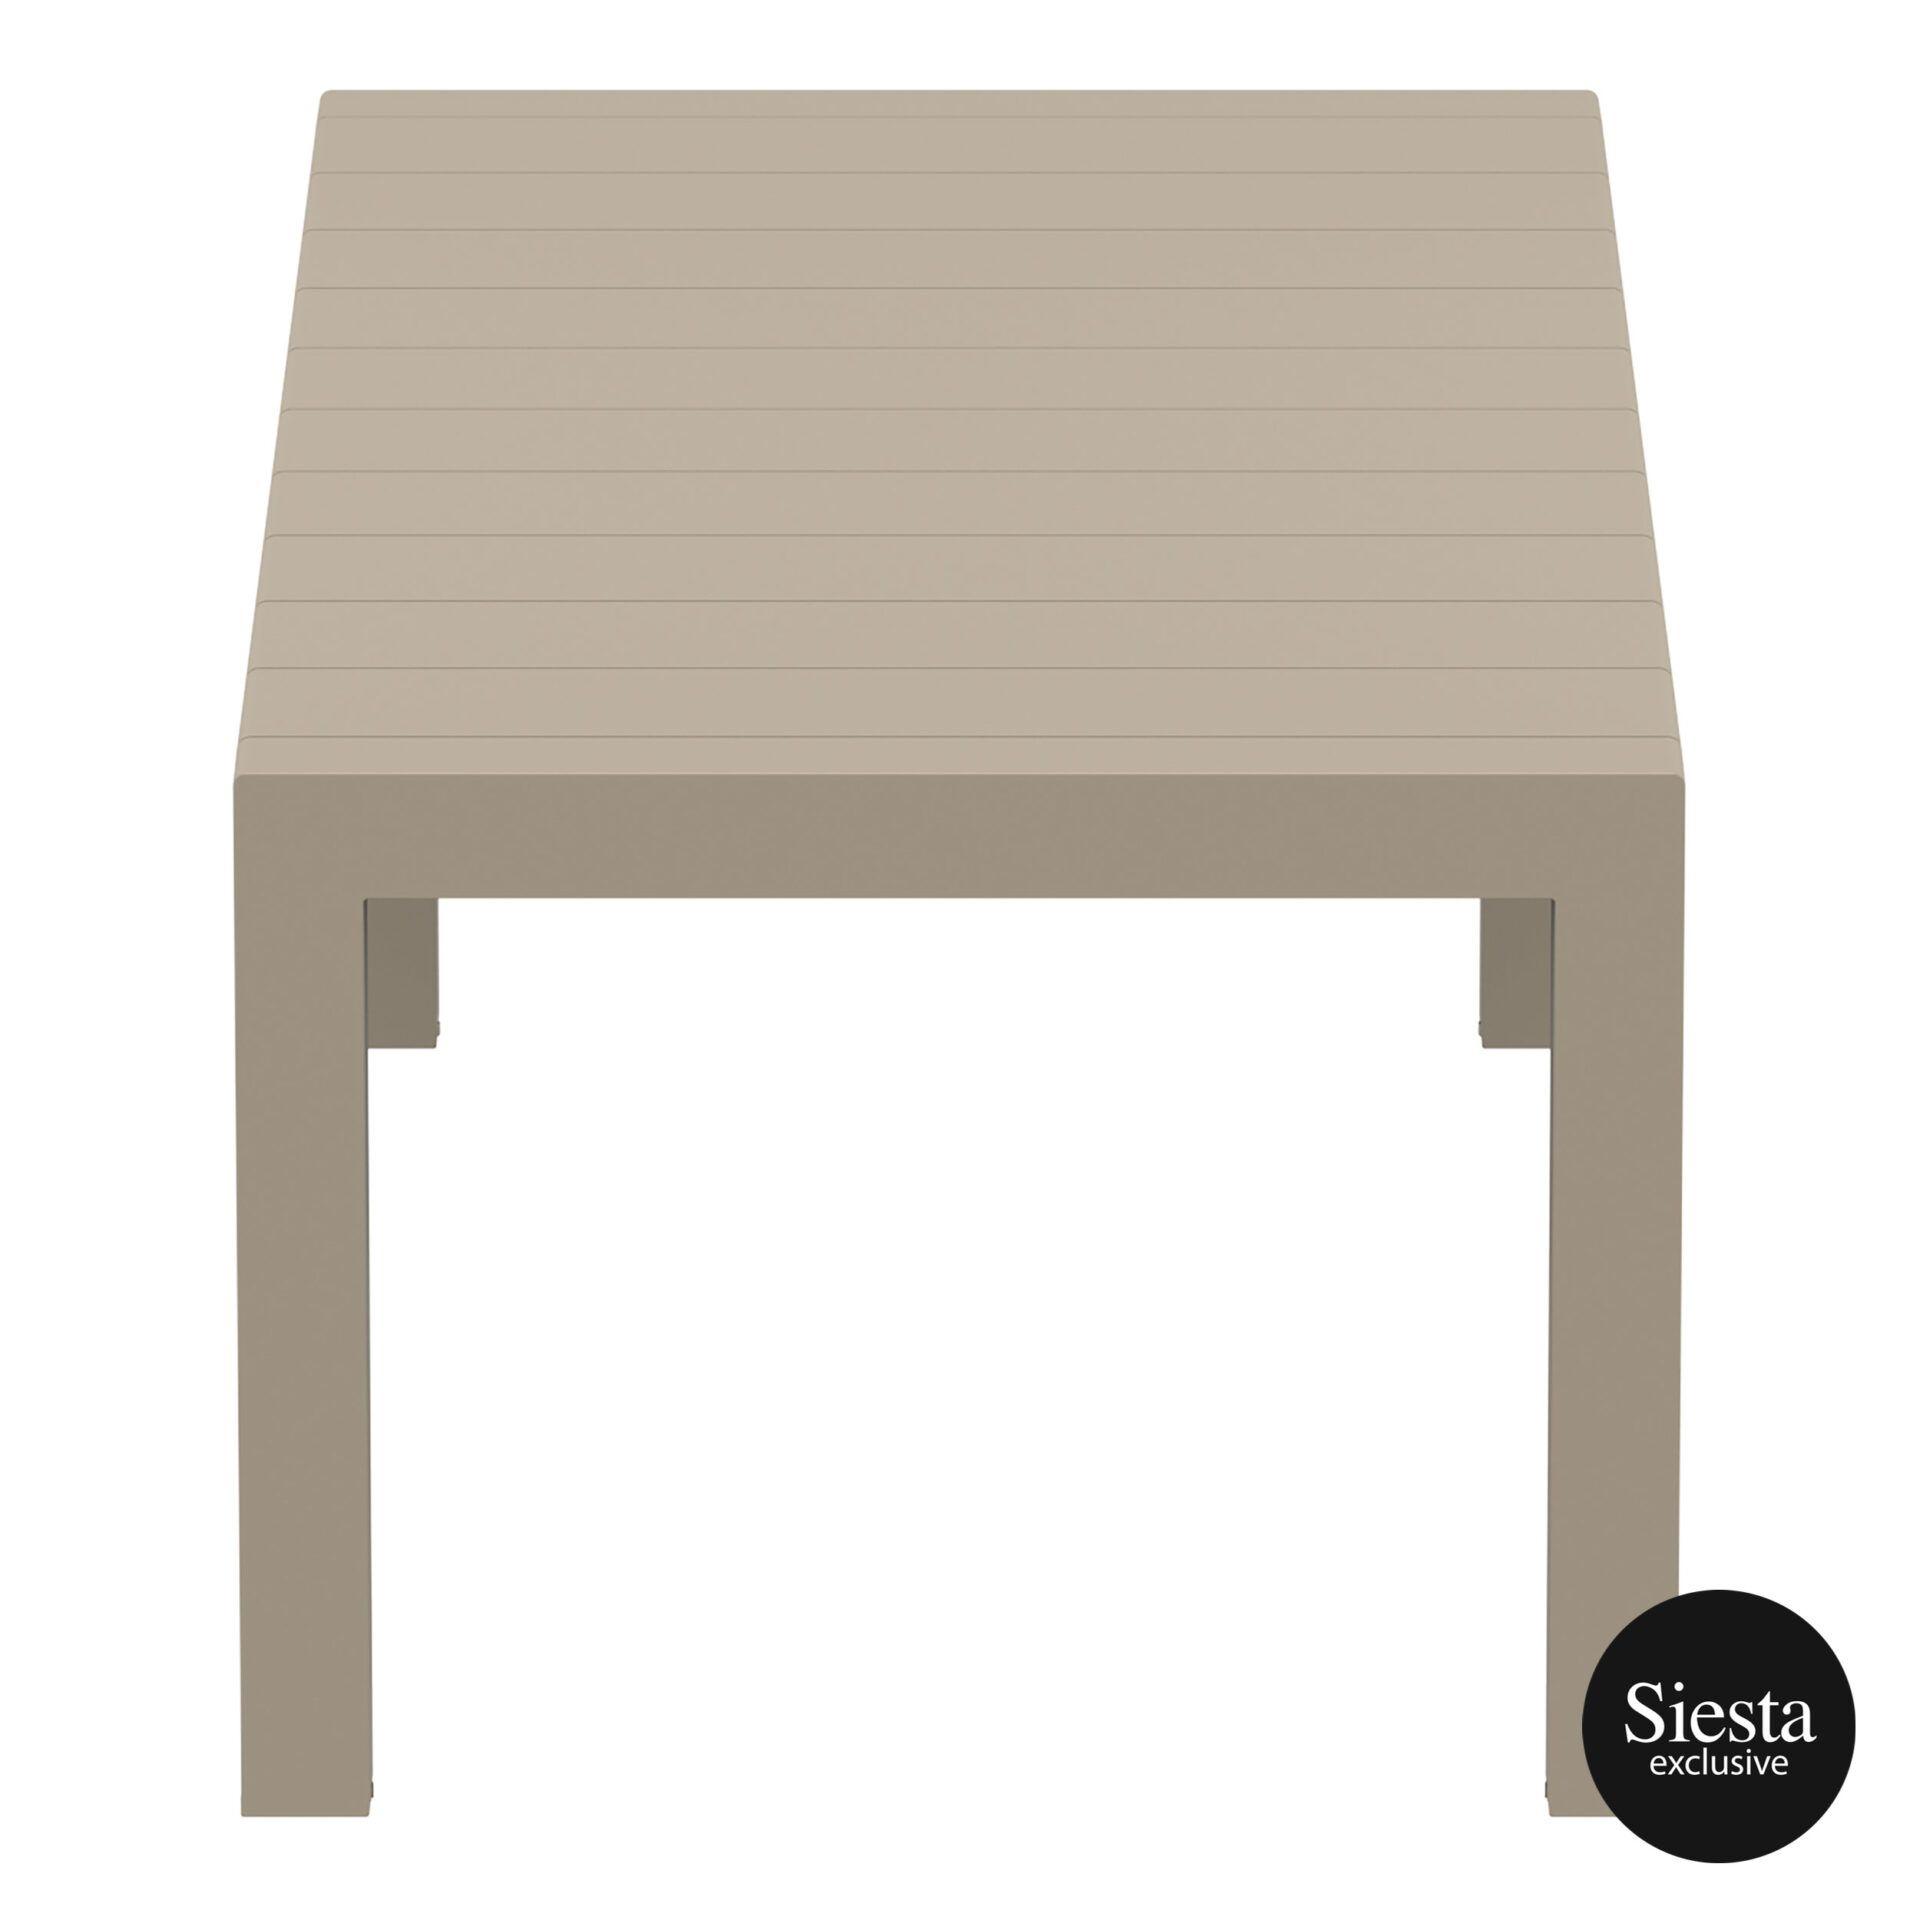 012 vegas table medium 220 taupe short edge